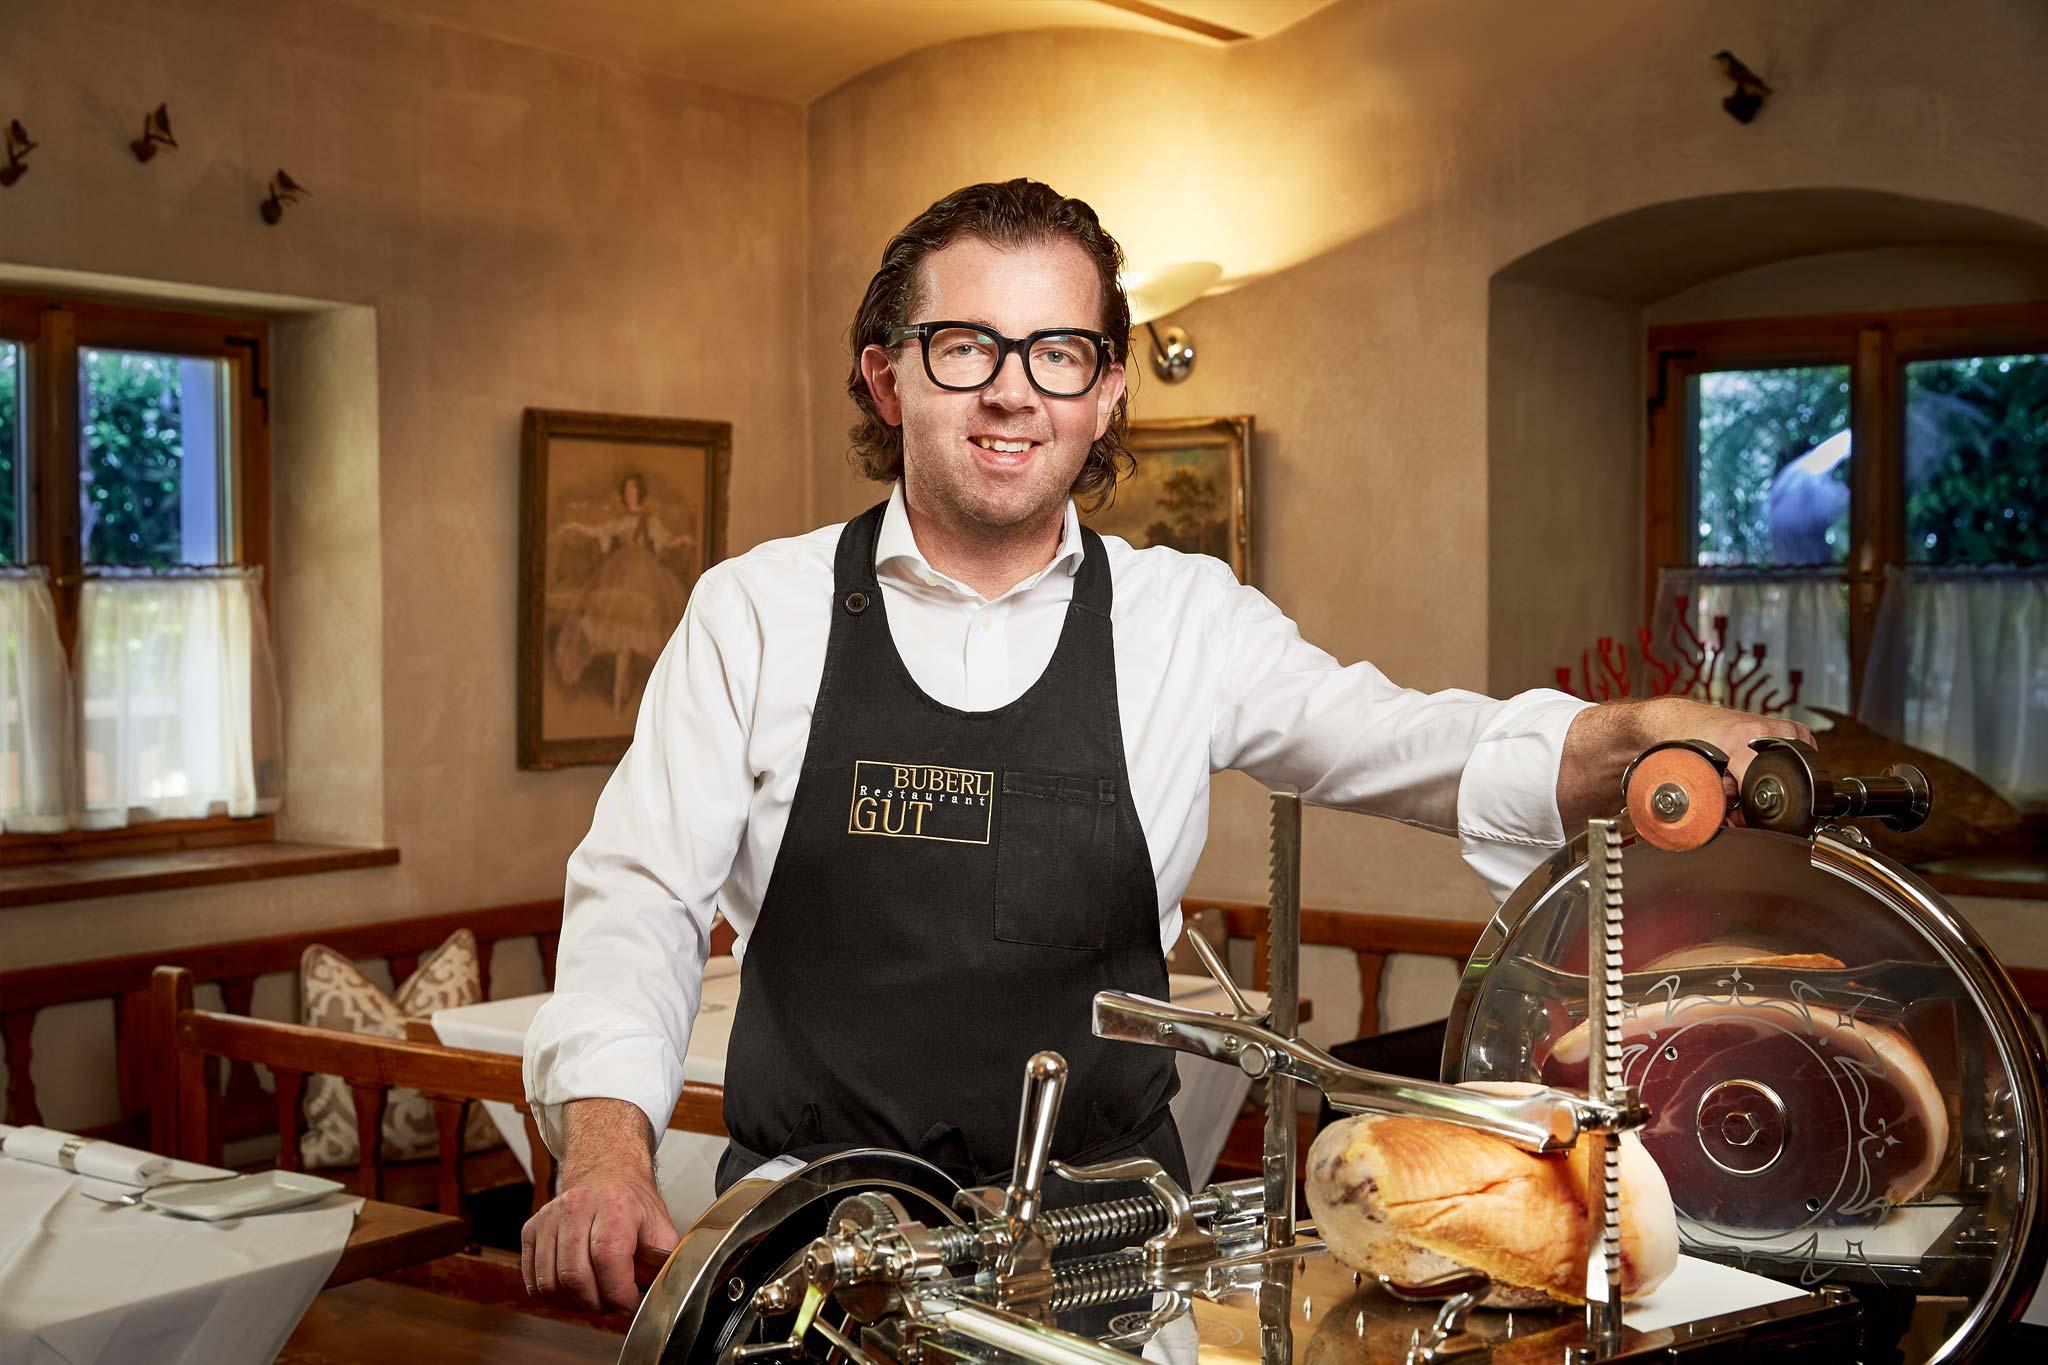 zum-buberlgut-restaurant-herr-bacher